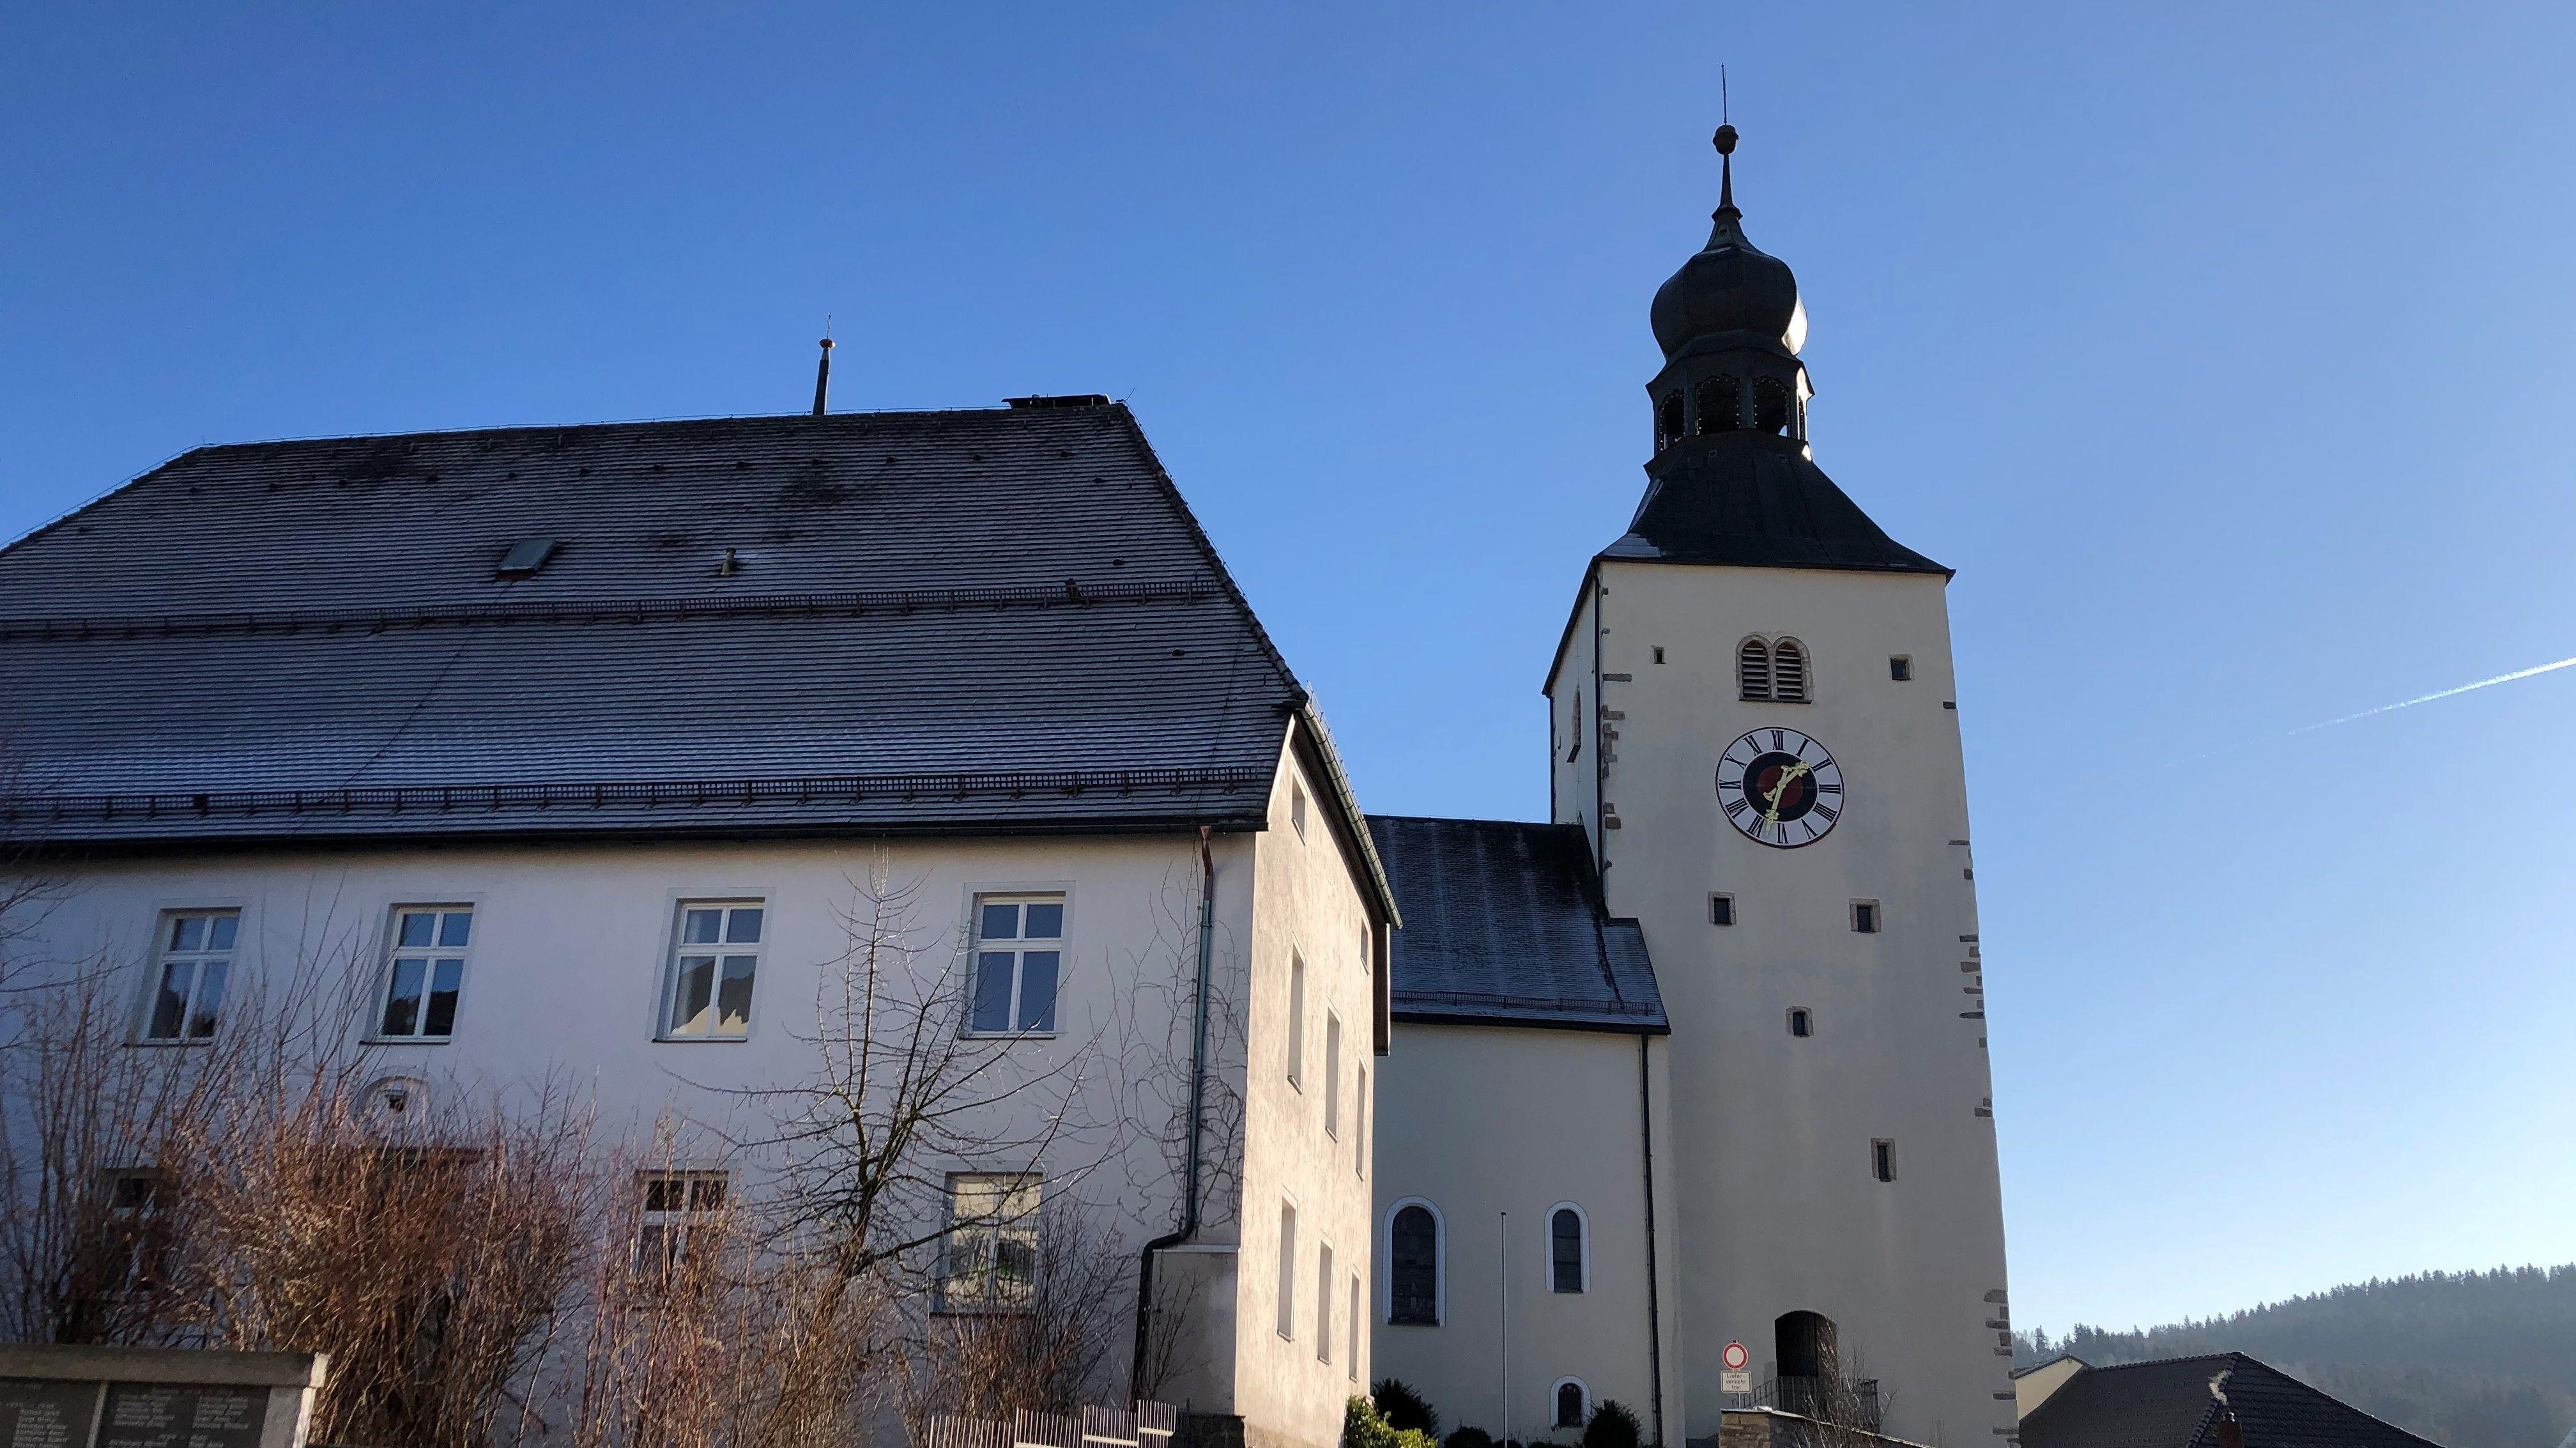 Kirchturm der Stadtpfarrkirche St. Michael in Regen